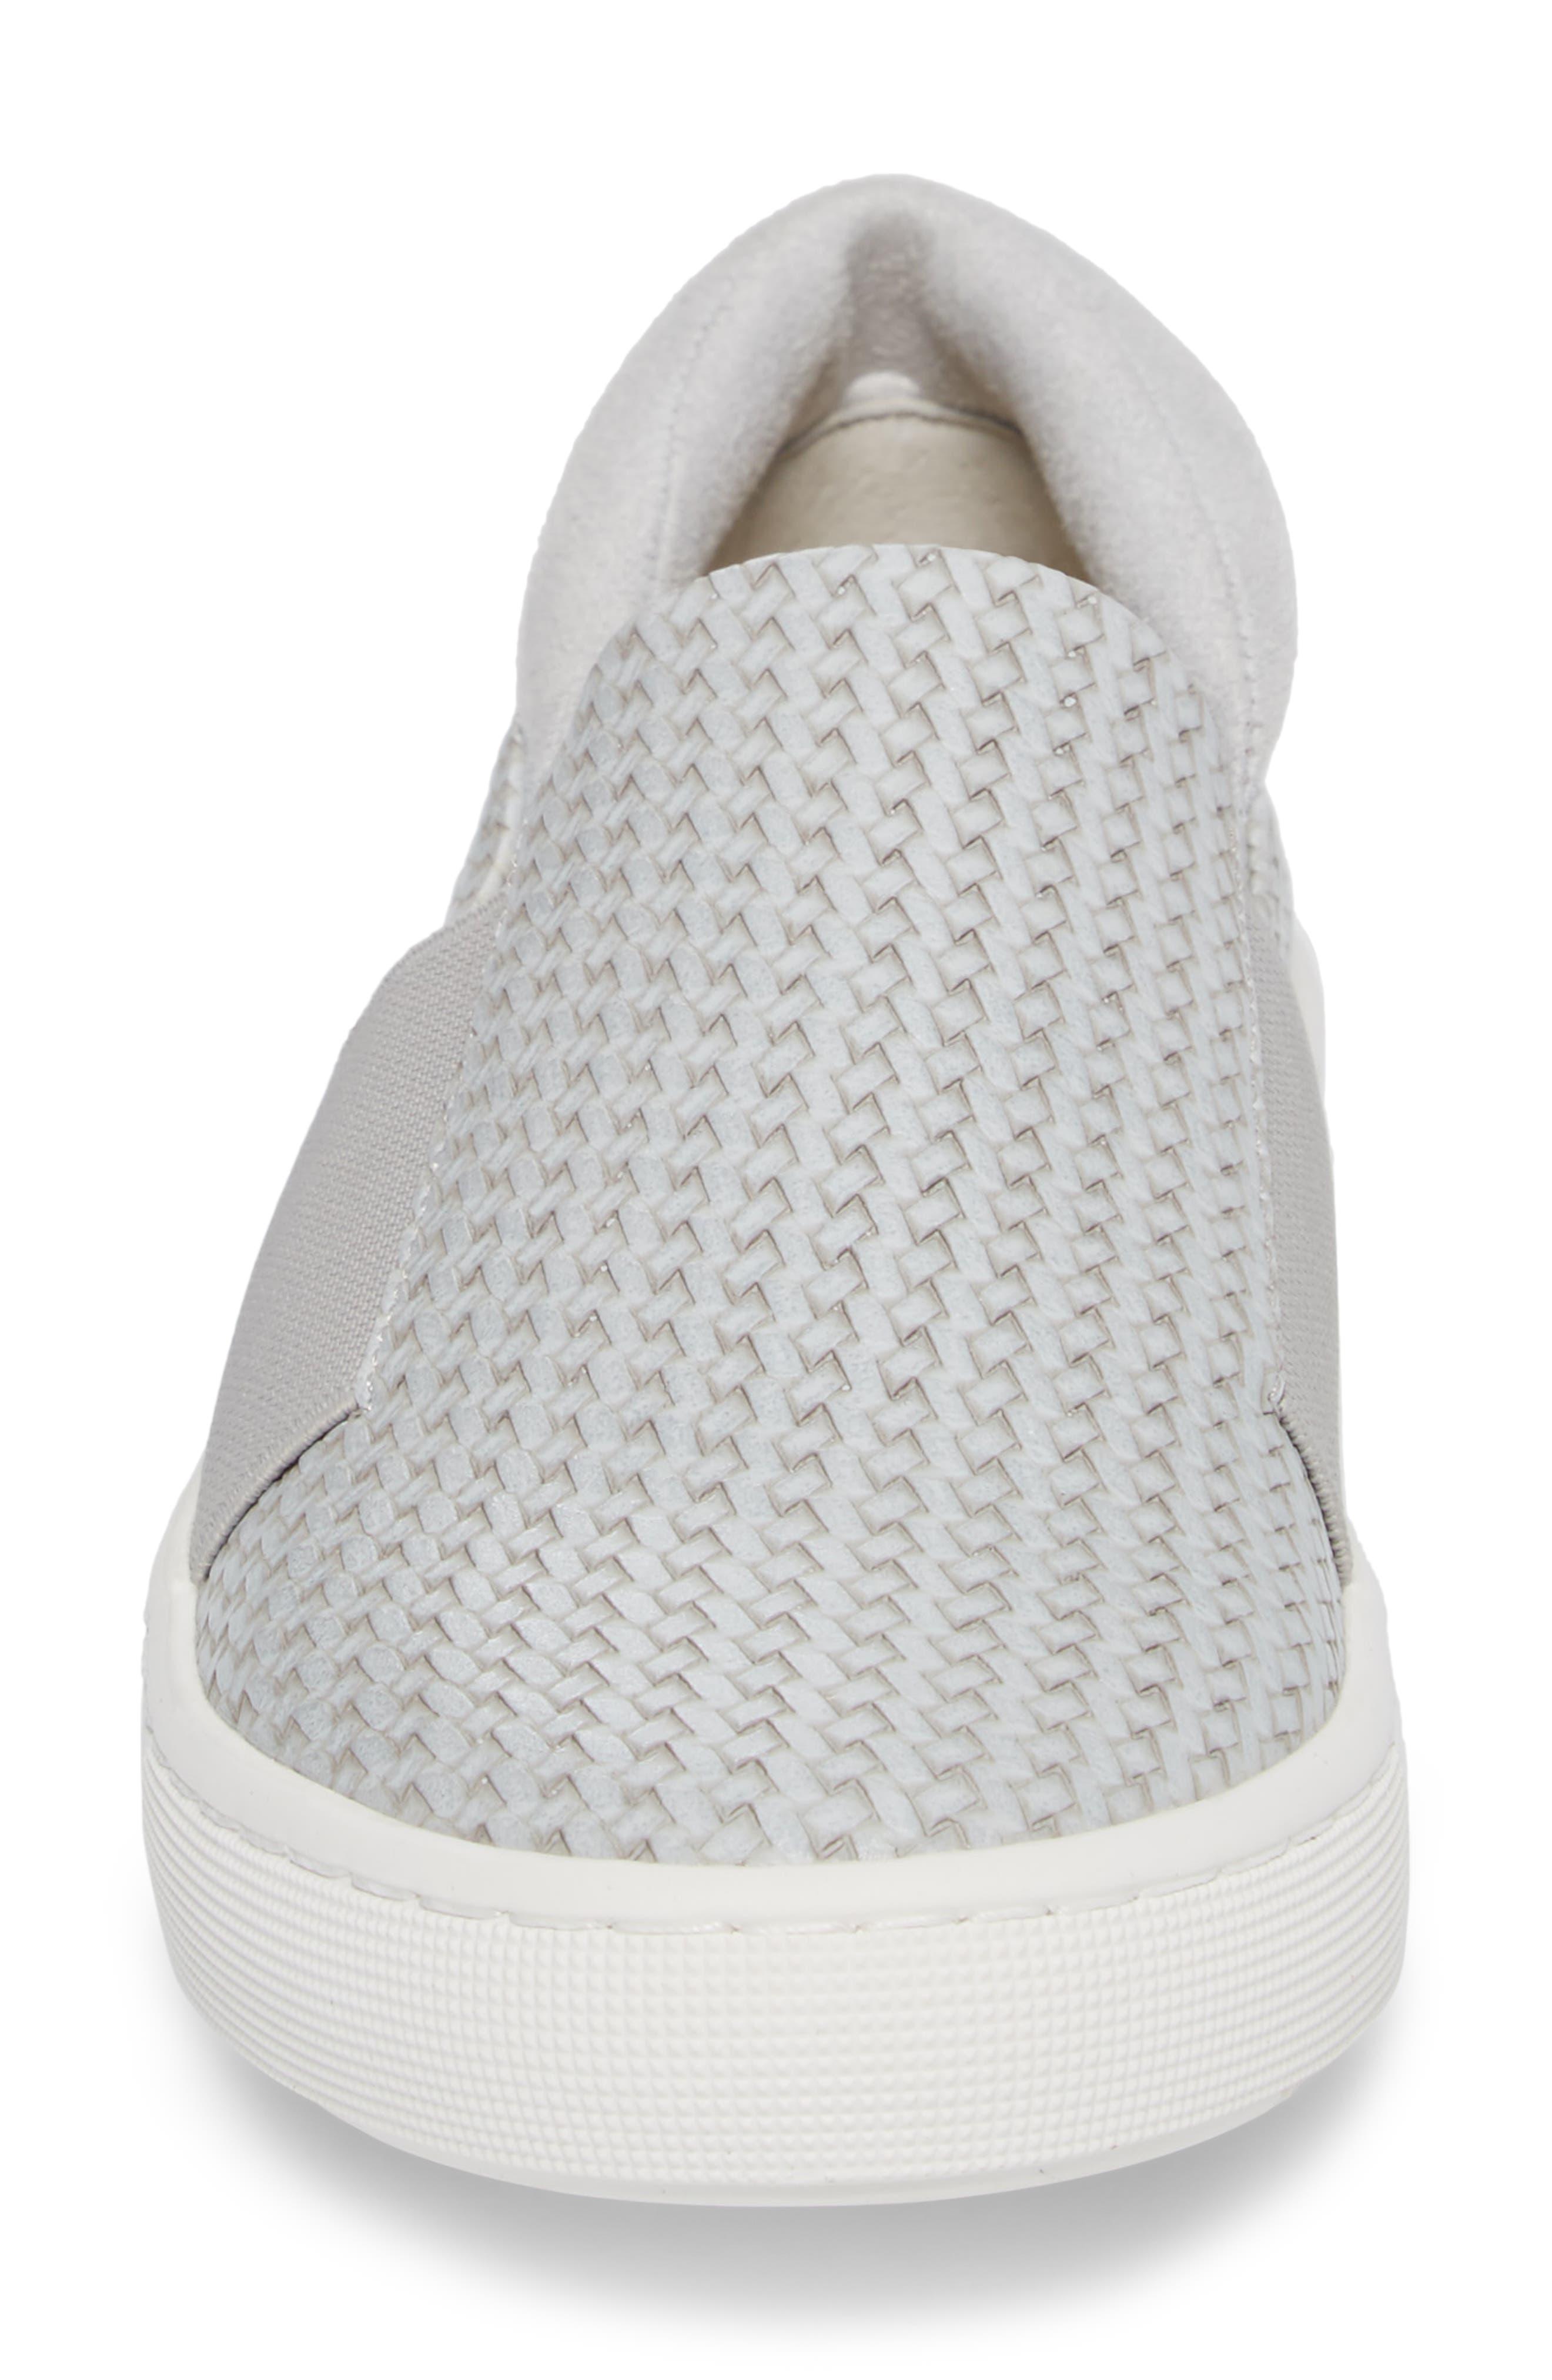 BELLA VITA, Ramp II Slip-On Sneaker, Alternate thumbnail 4, color, LIGHT GREY FABRIC